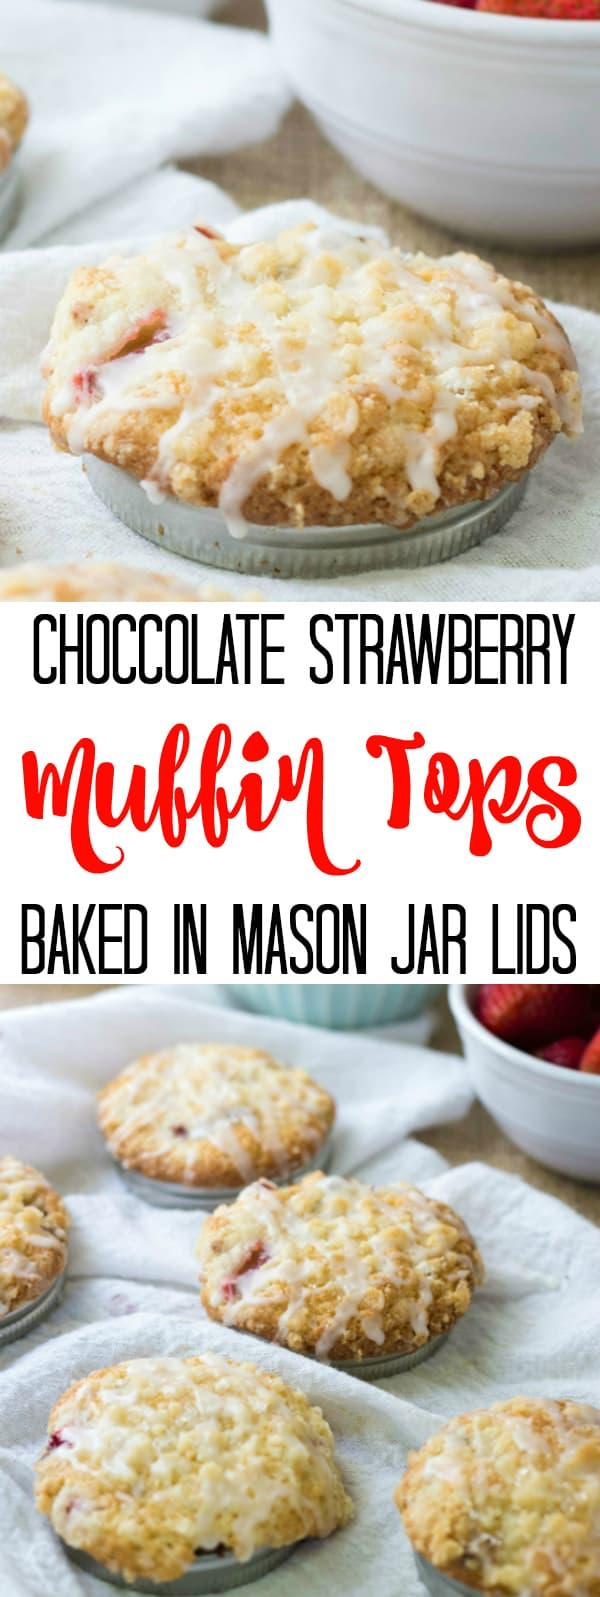 Chocolate Strawberry Muffin Tops in Mason Jar Lids